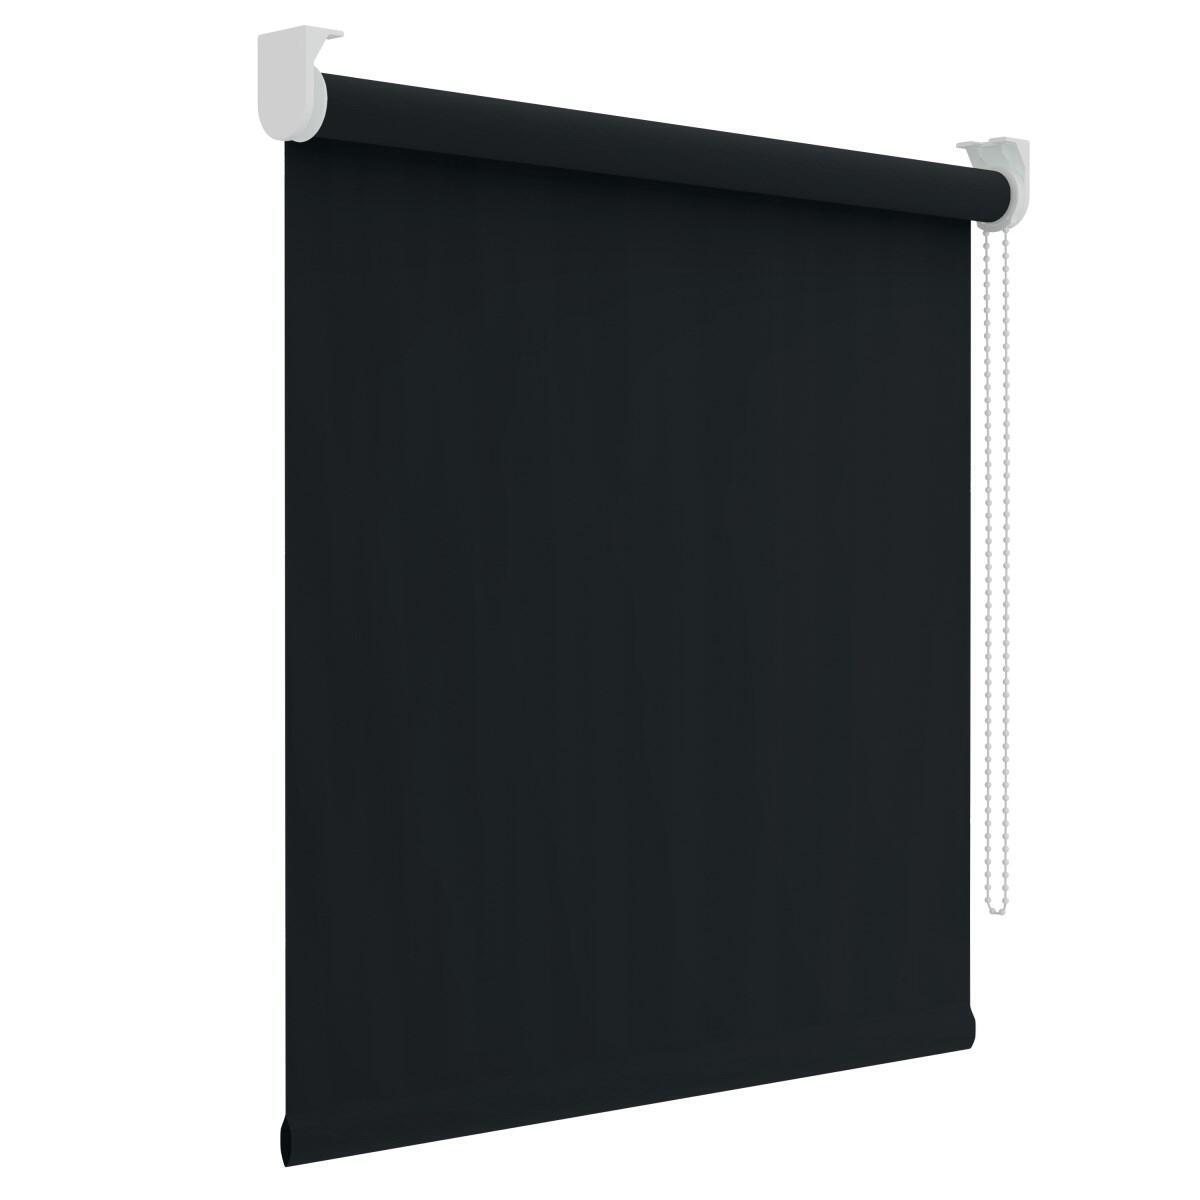 Tenda a rullo oscurante Dublin nero 60 x 190 cm - 1